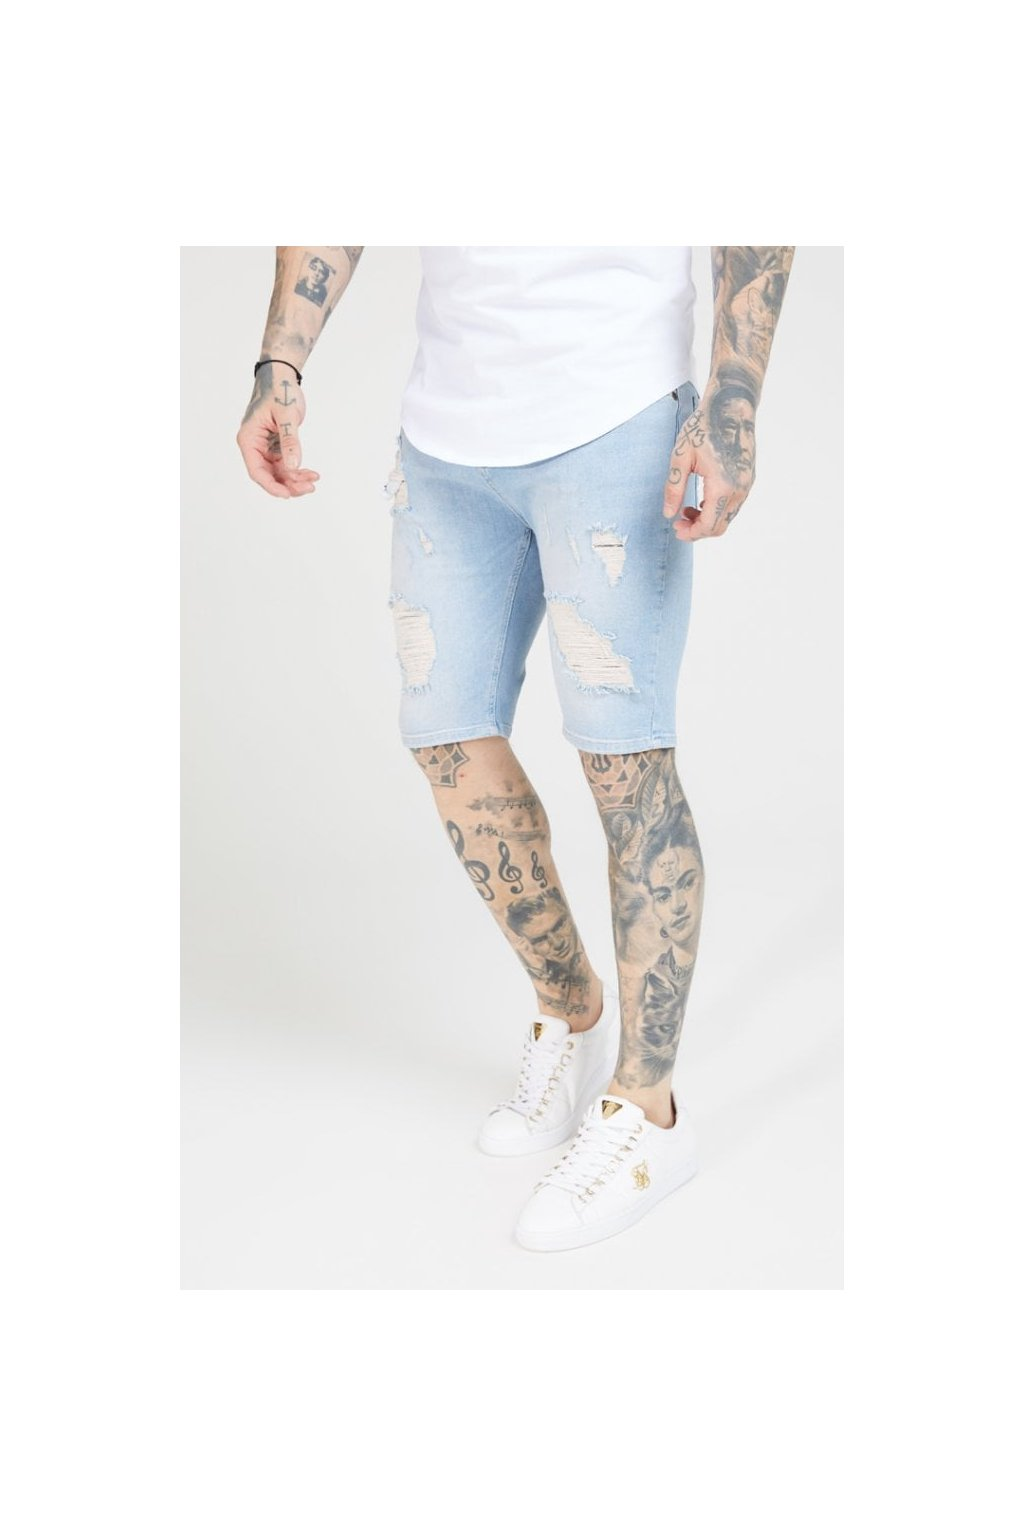 siksilk distressed skinny shorts light wash p1706 28643 medium